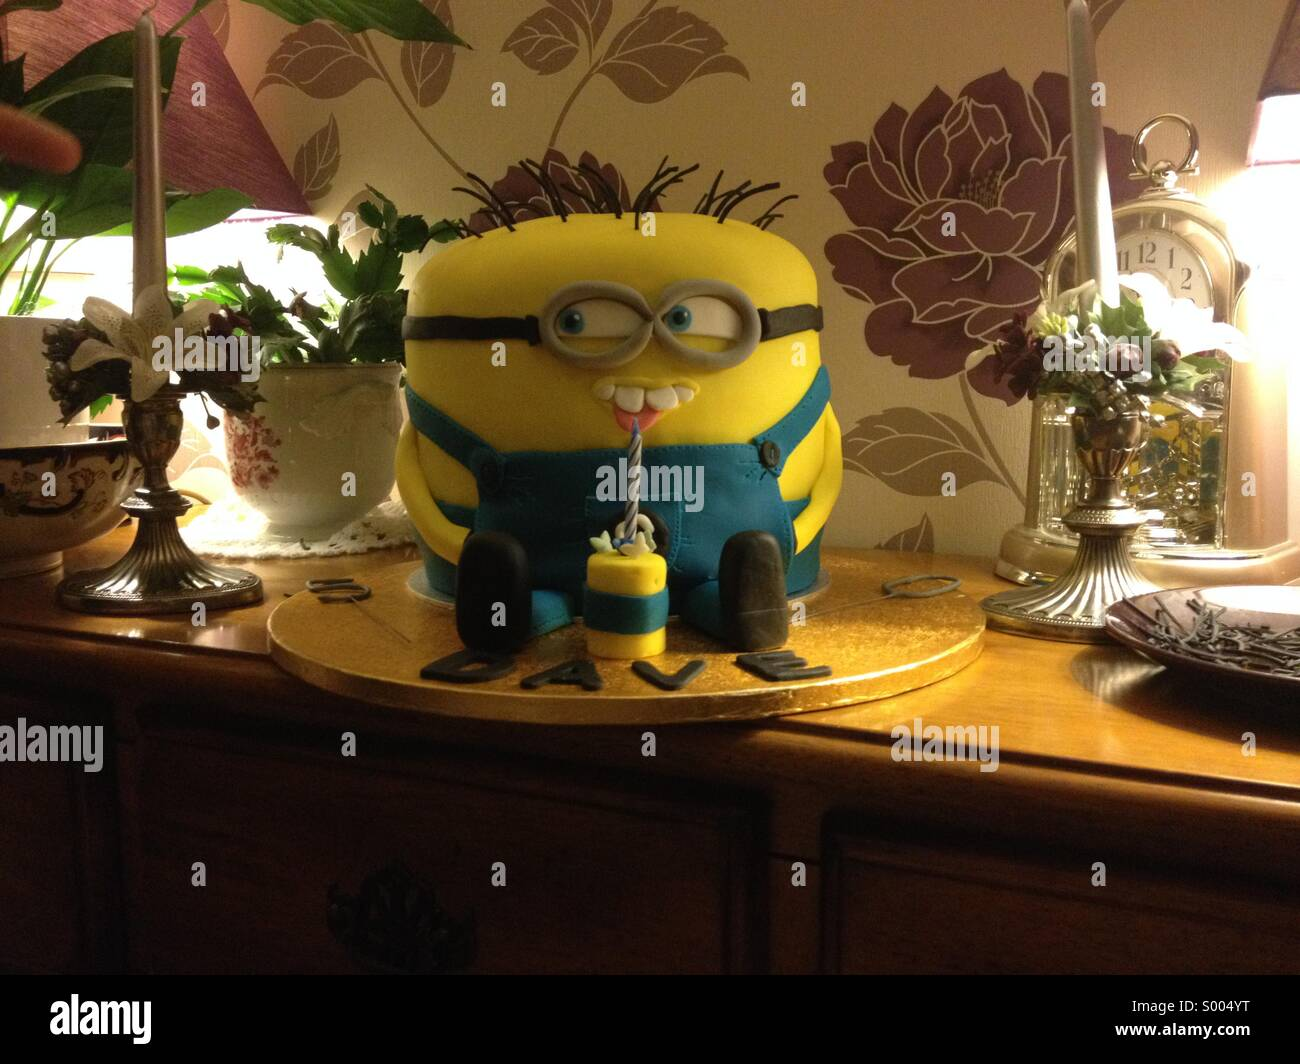 Minion Dave birthday cake Stock Photo Royalty Free Image